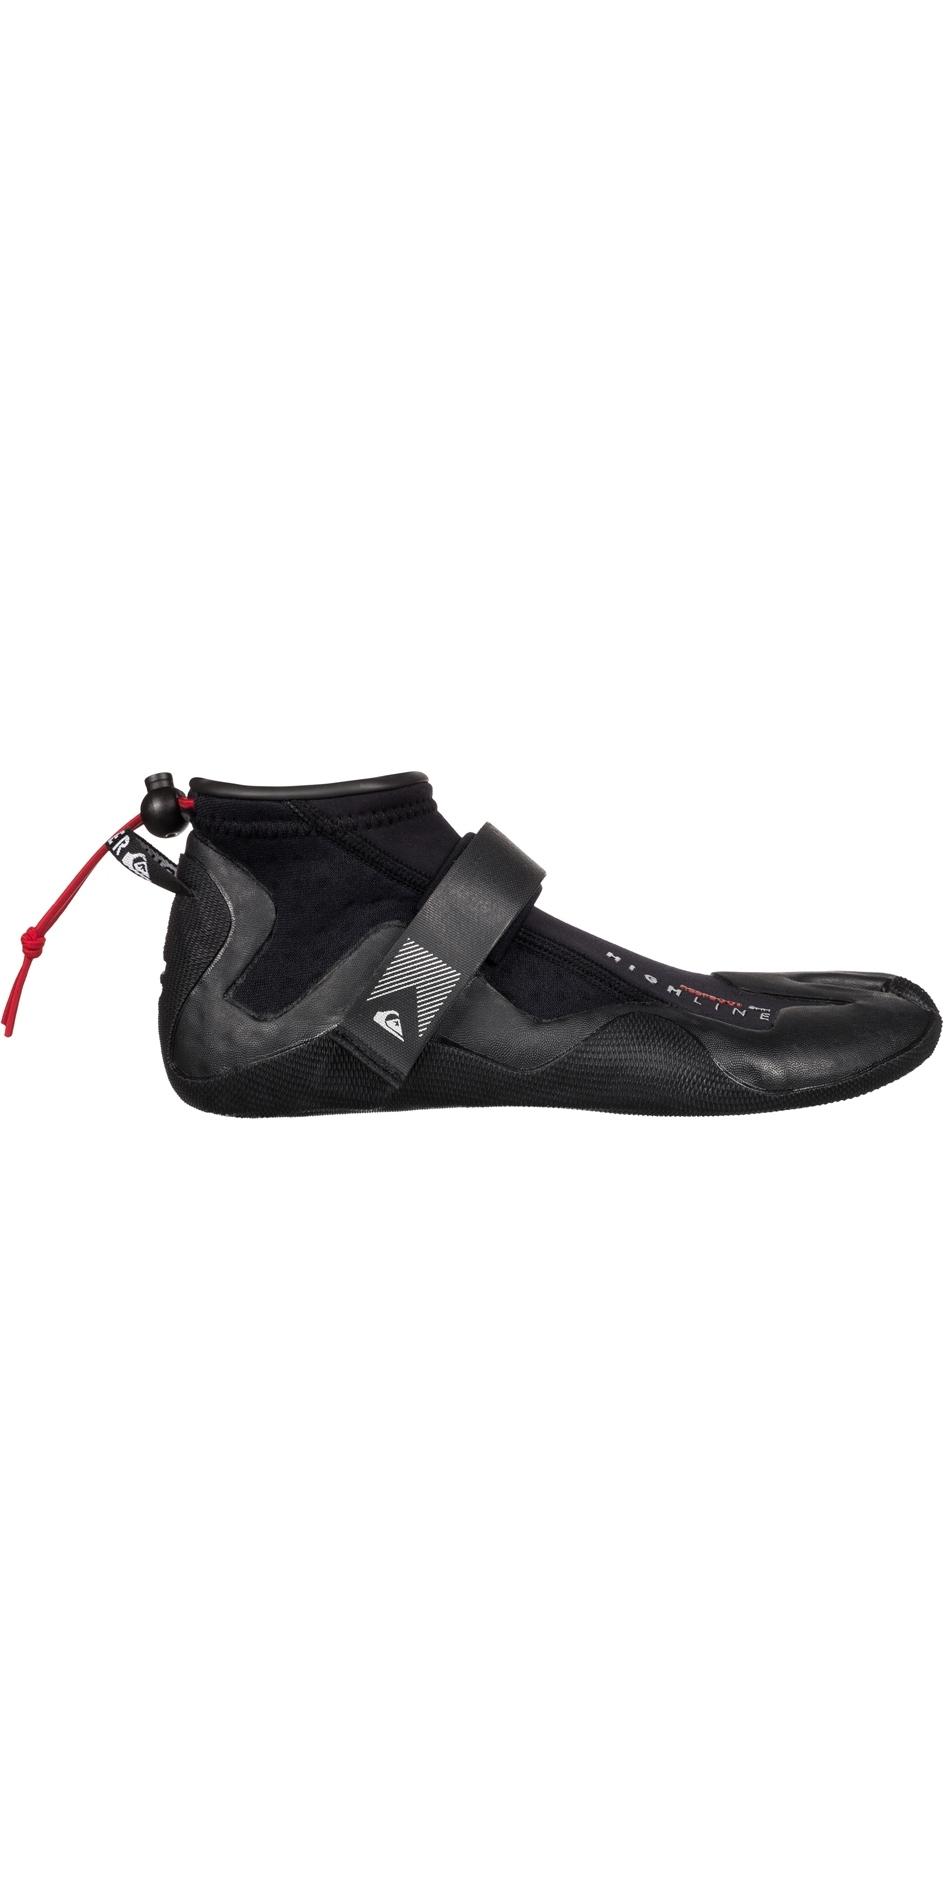 9db6252e0890cc 2019 Quiksilver Highline Reef 2mm Split Toe Neoprene Surf Shoe Black  Eqyww03004 - Wetsuit | Wetsuit Outlet